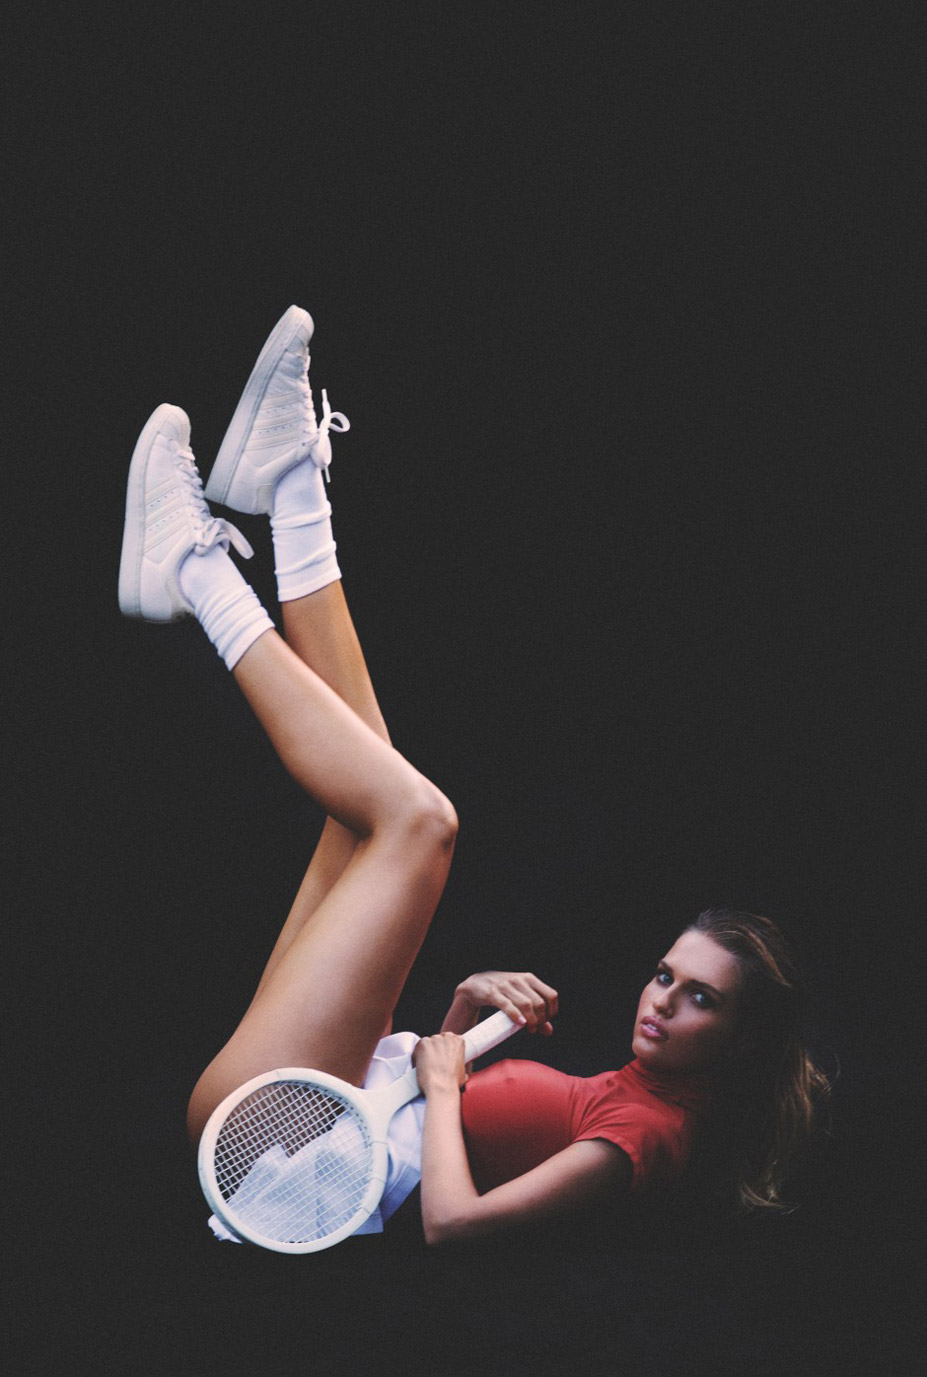 Голая спортсменка Рэйчел Мортенсен / Rachel Mortenson by Josh Reed in Galore Magazine august 2014